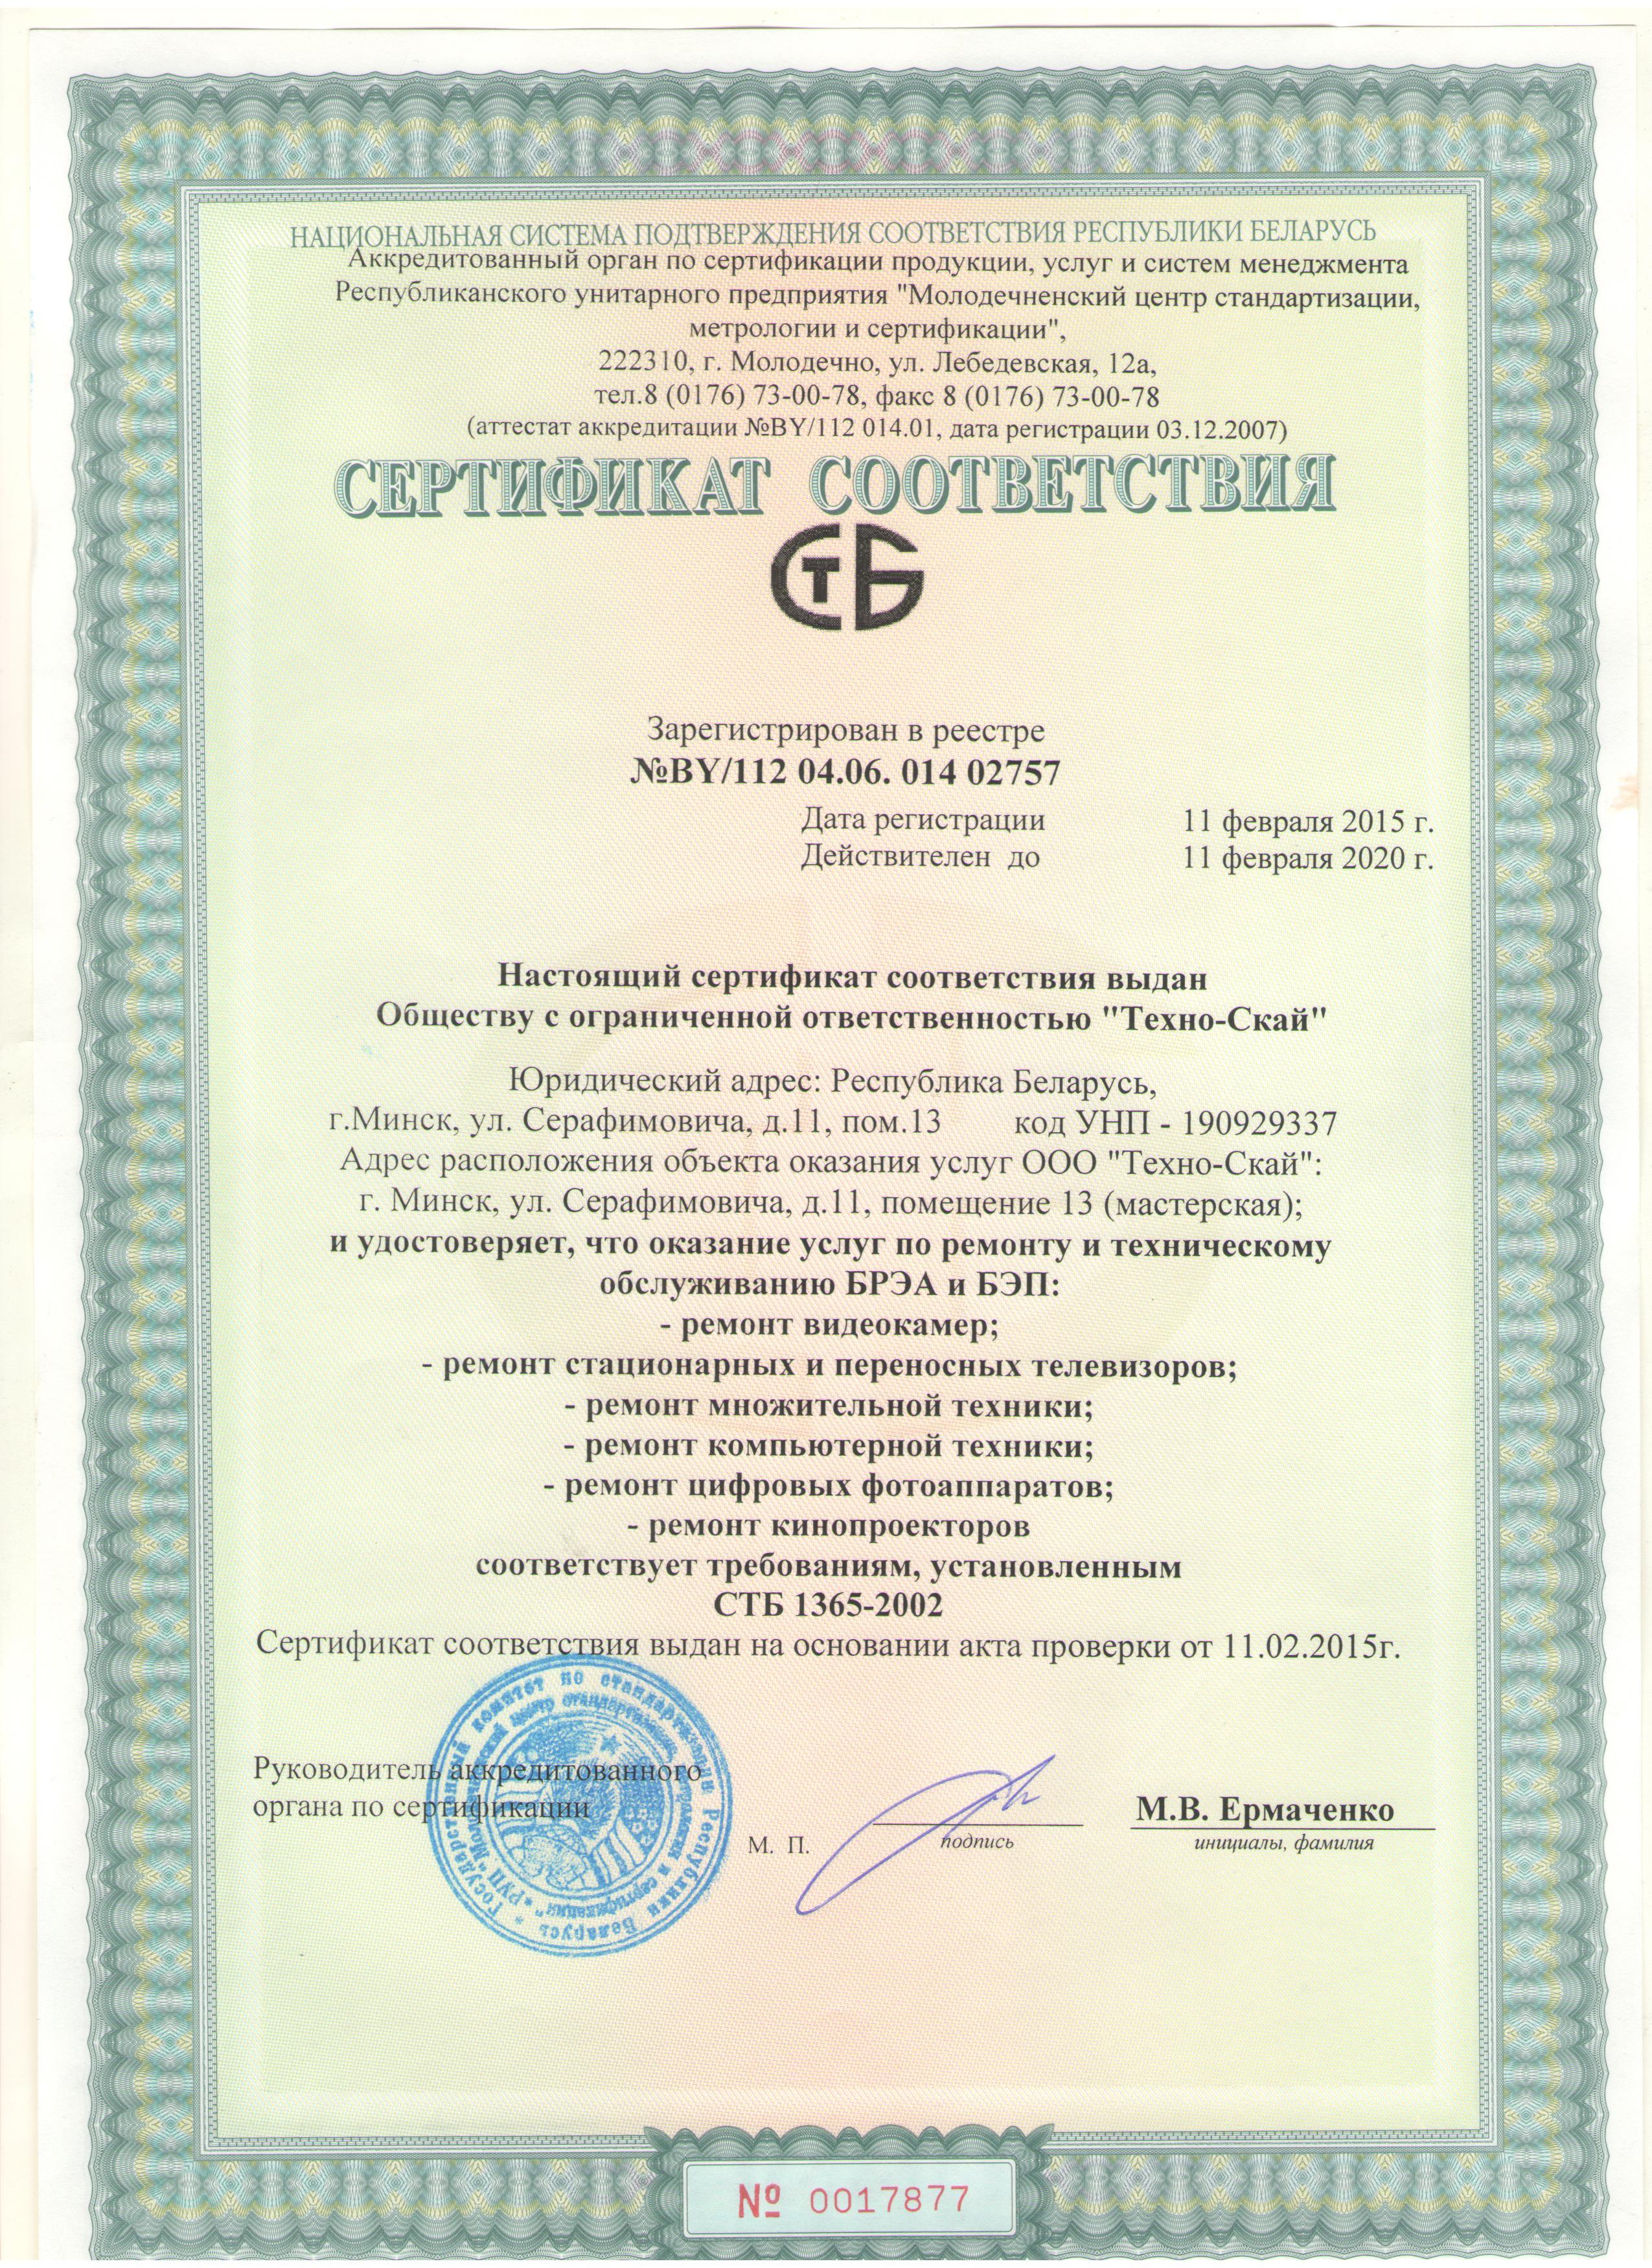 сервисный центр сертификат